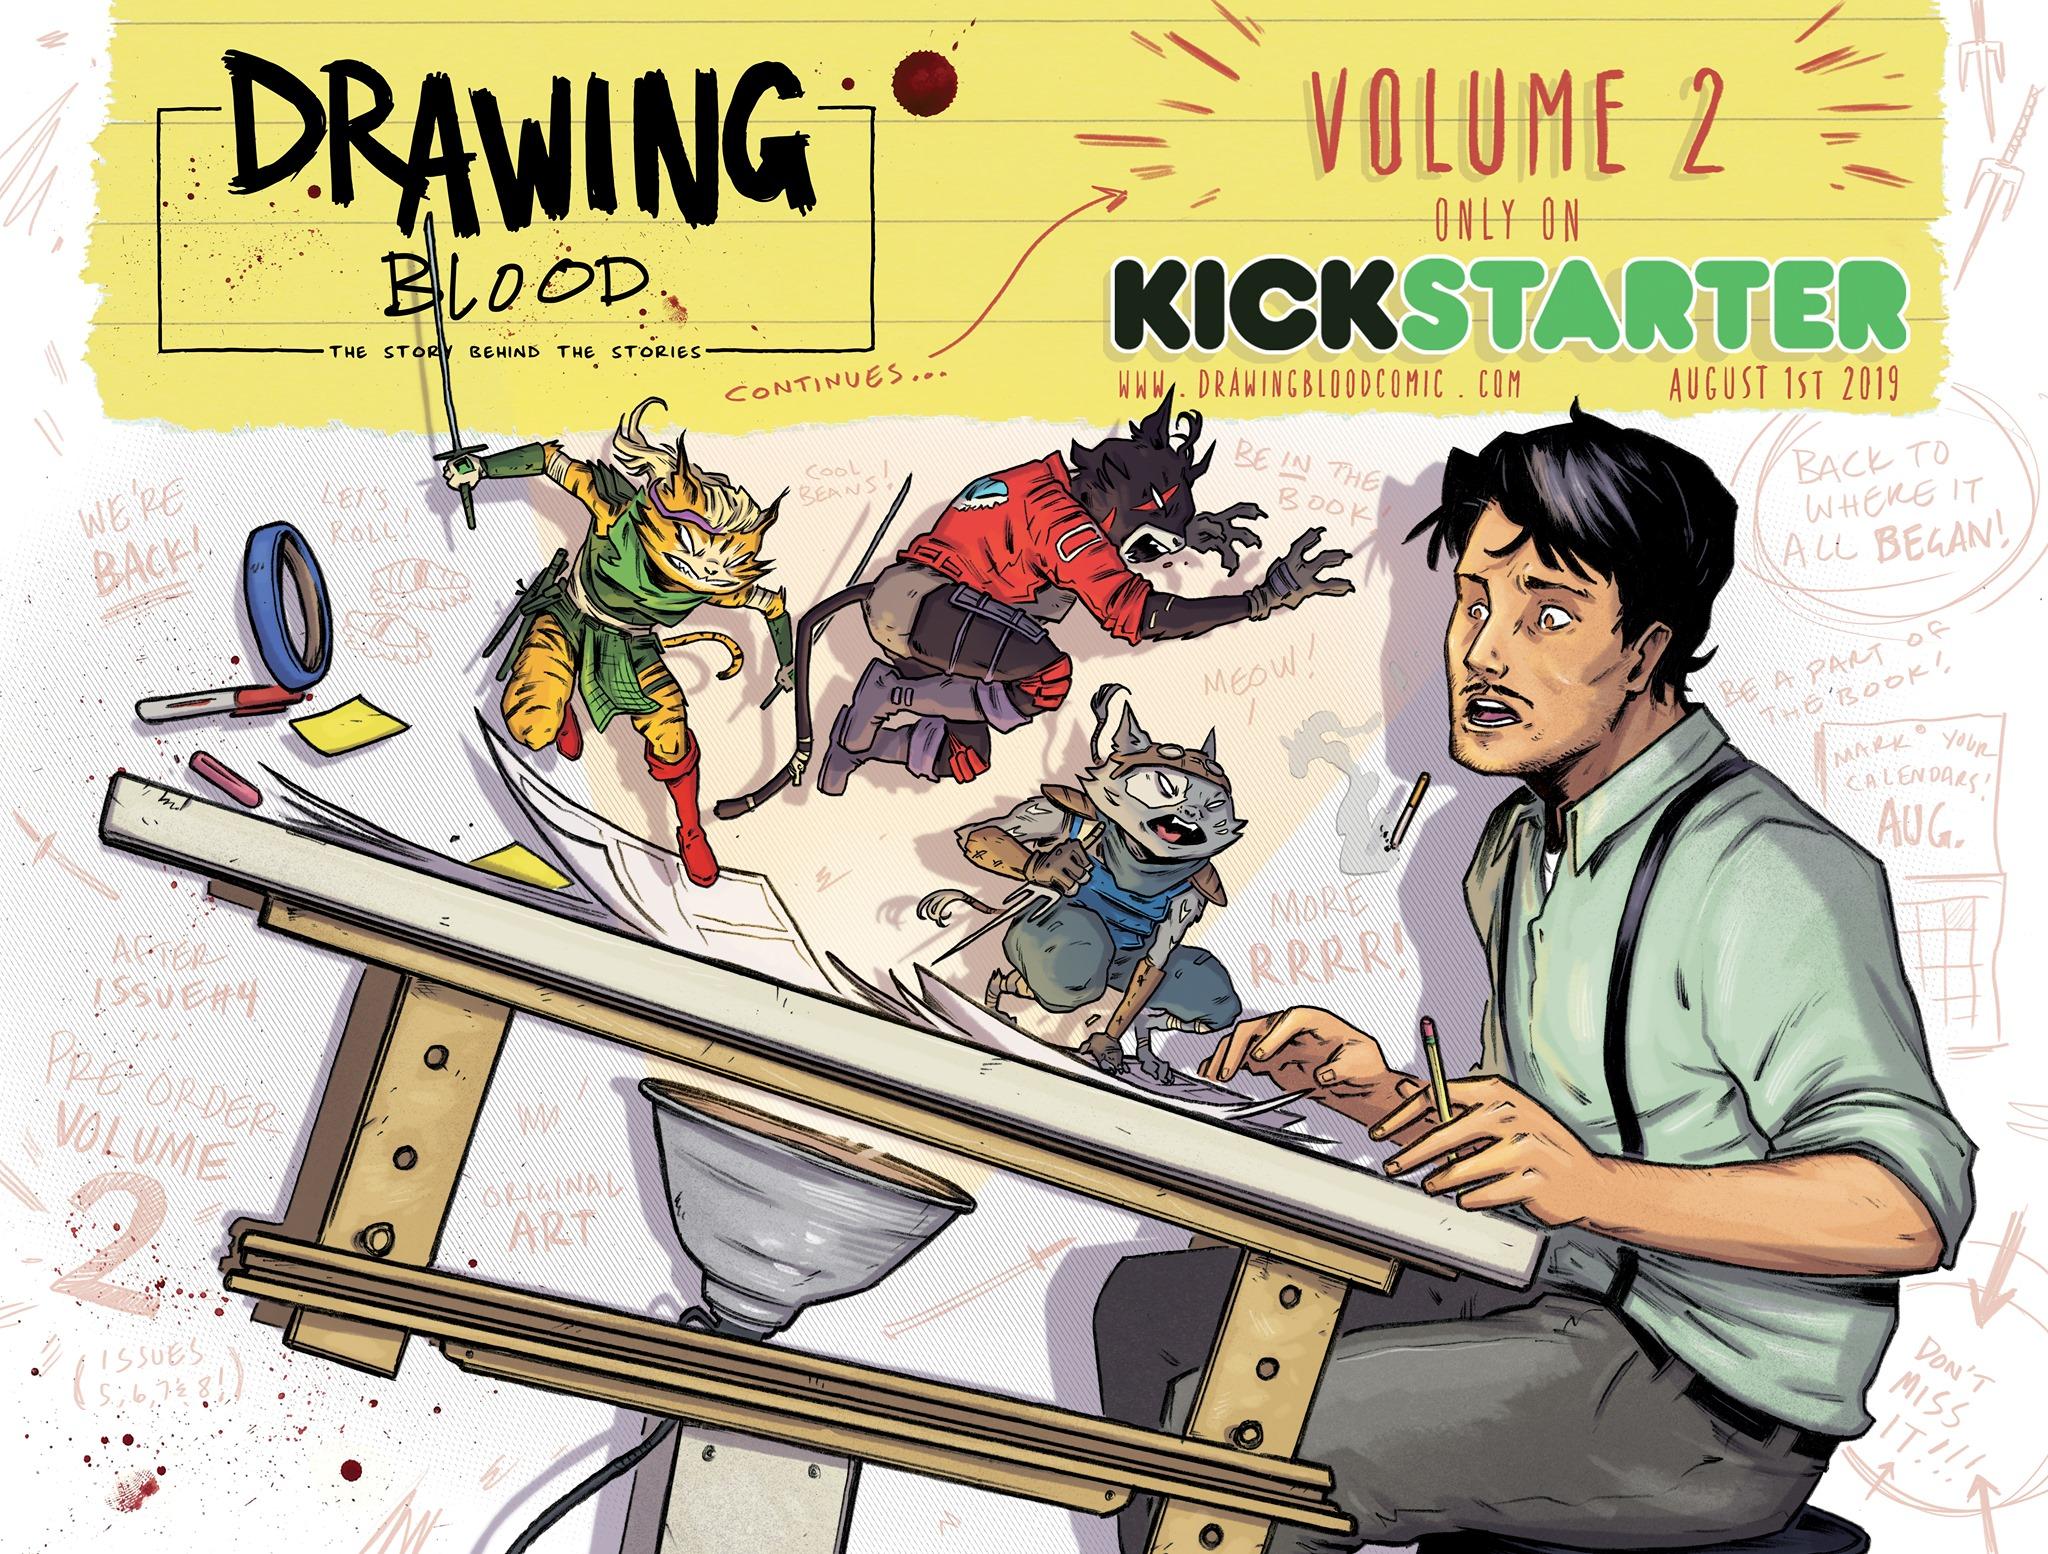 Drawing Blood Volume 2 - TOMORROW!!!